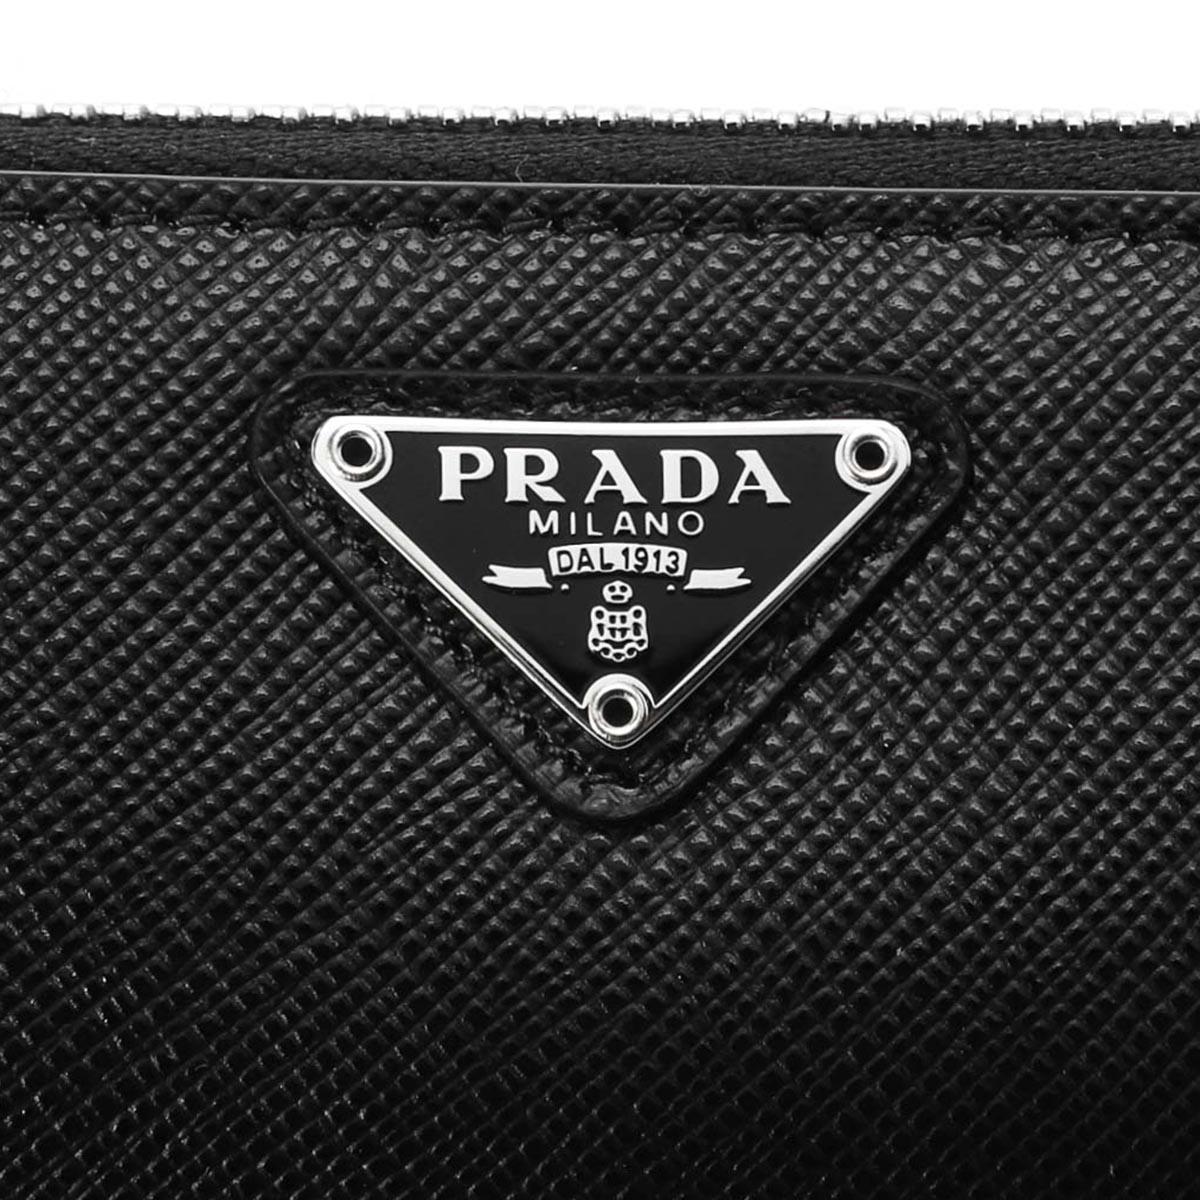 PRADA プラダ ペンケース/SAFFIANO TRIANGLE メンズ